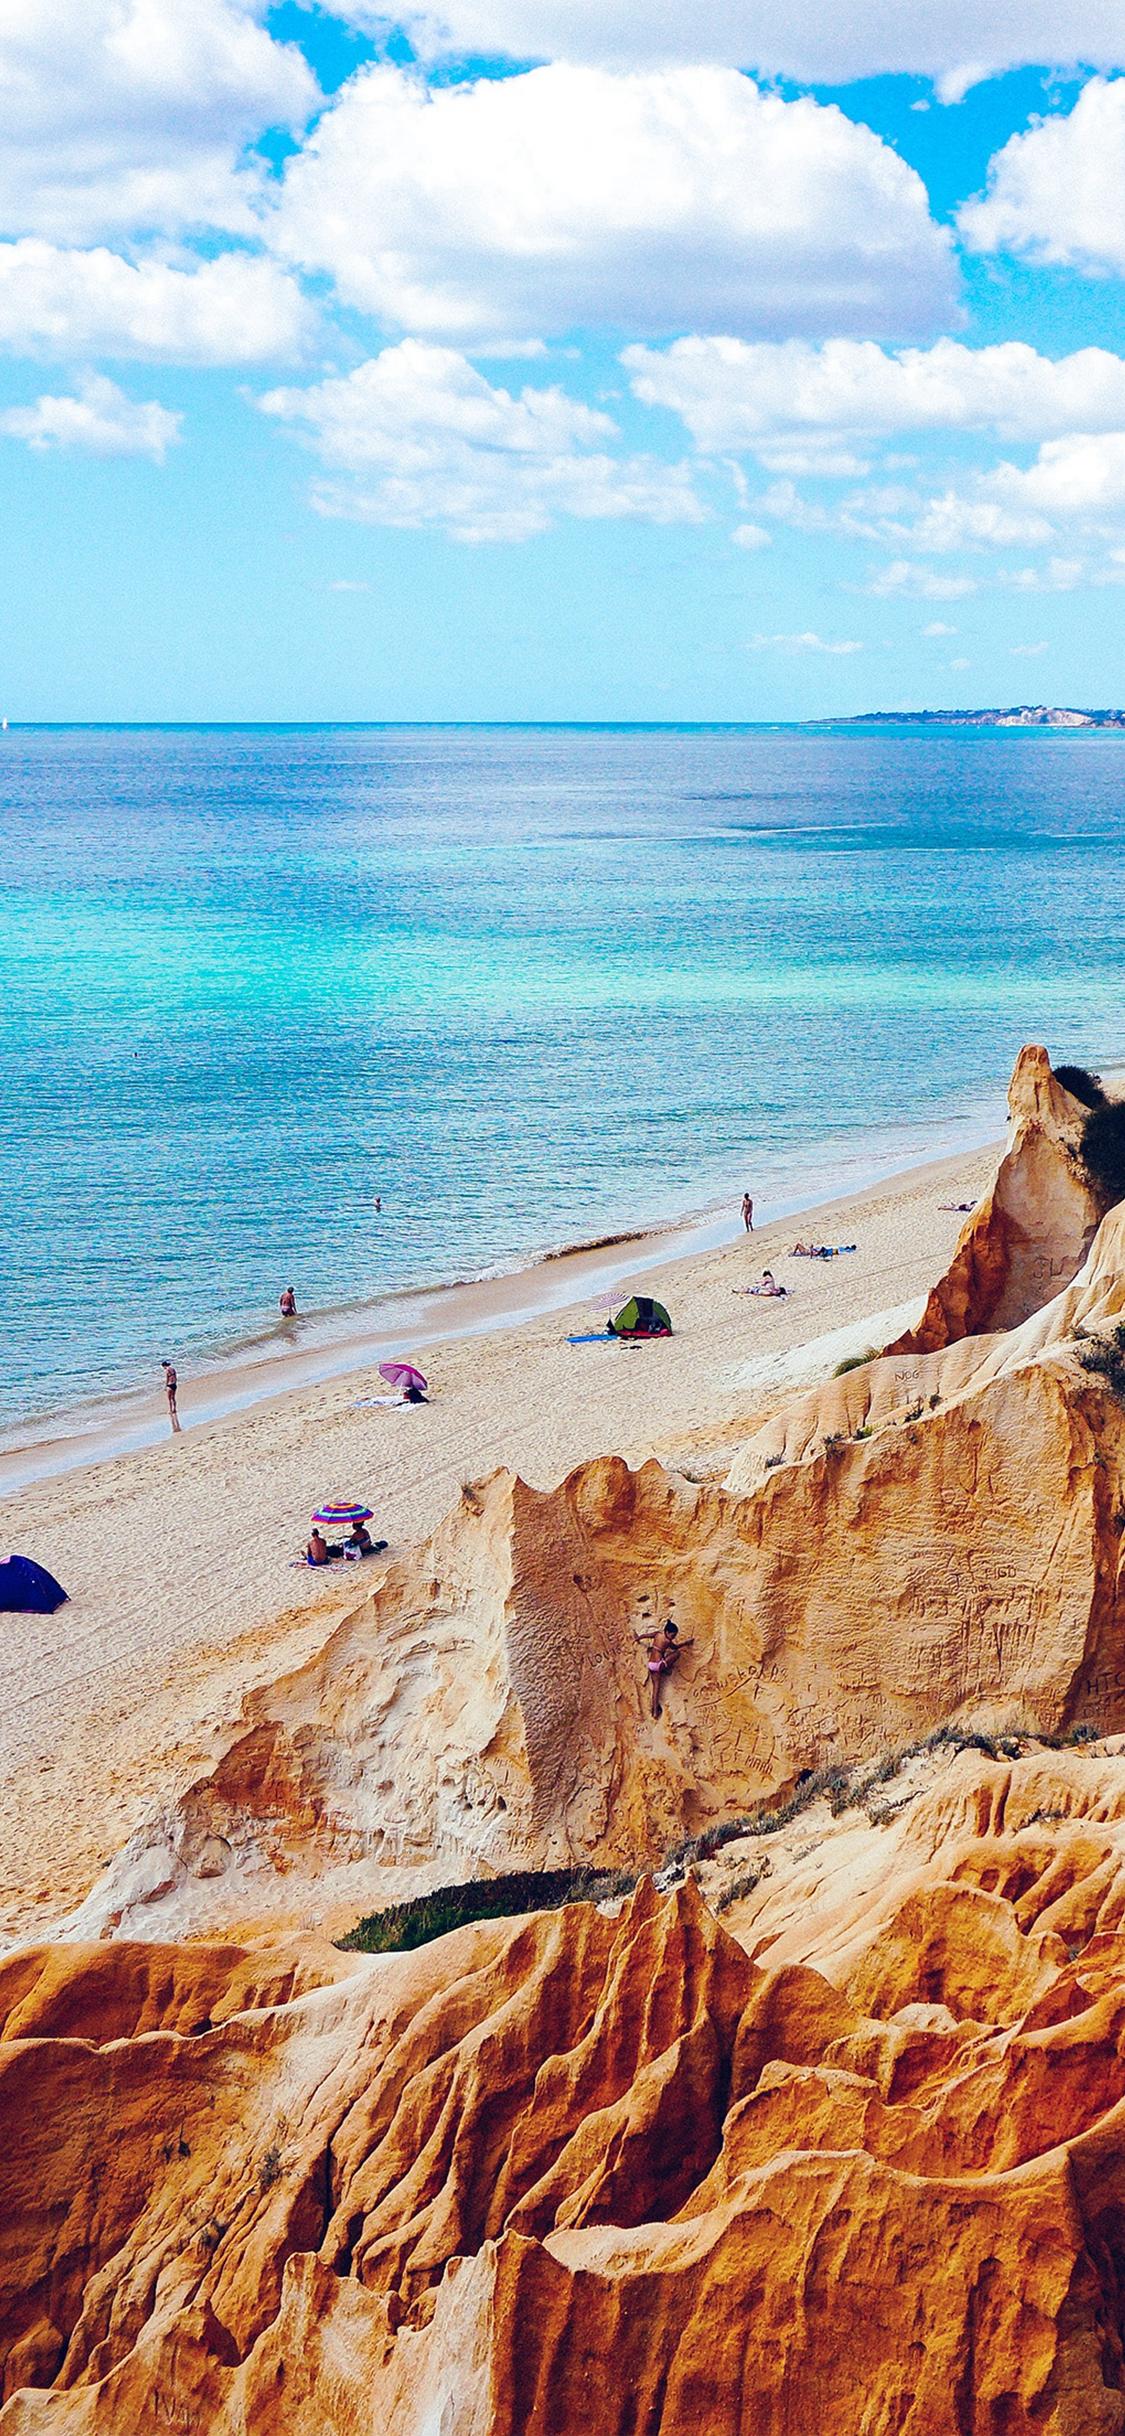 Nature Sea Vacation Beach Rock Summer Blue Iphone X Wallpaper